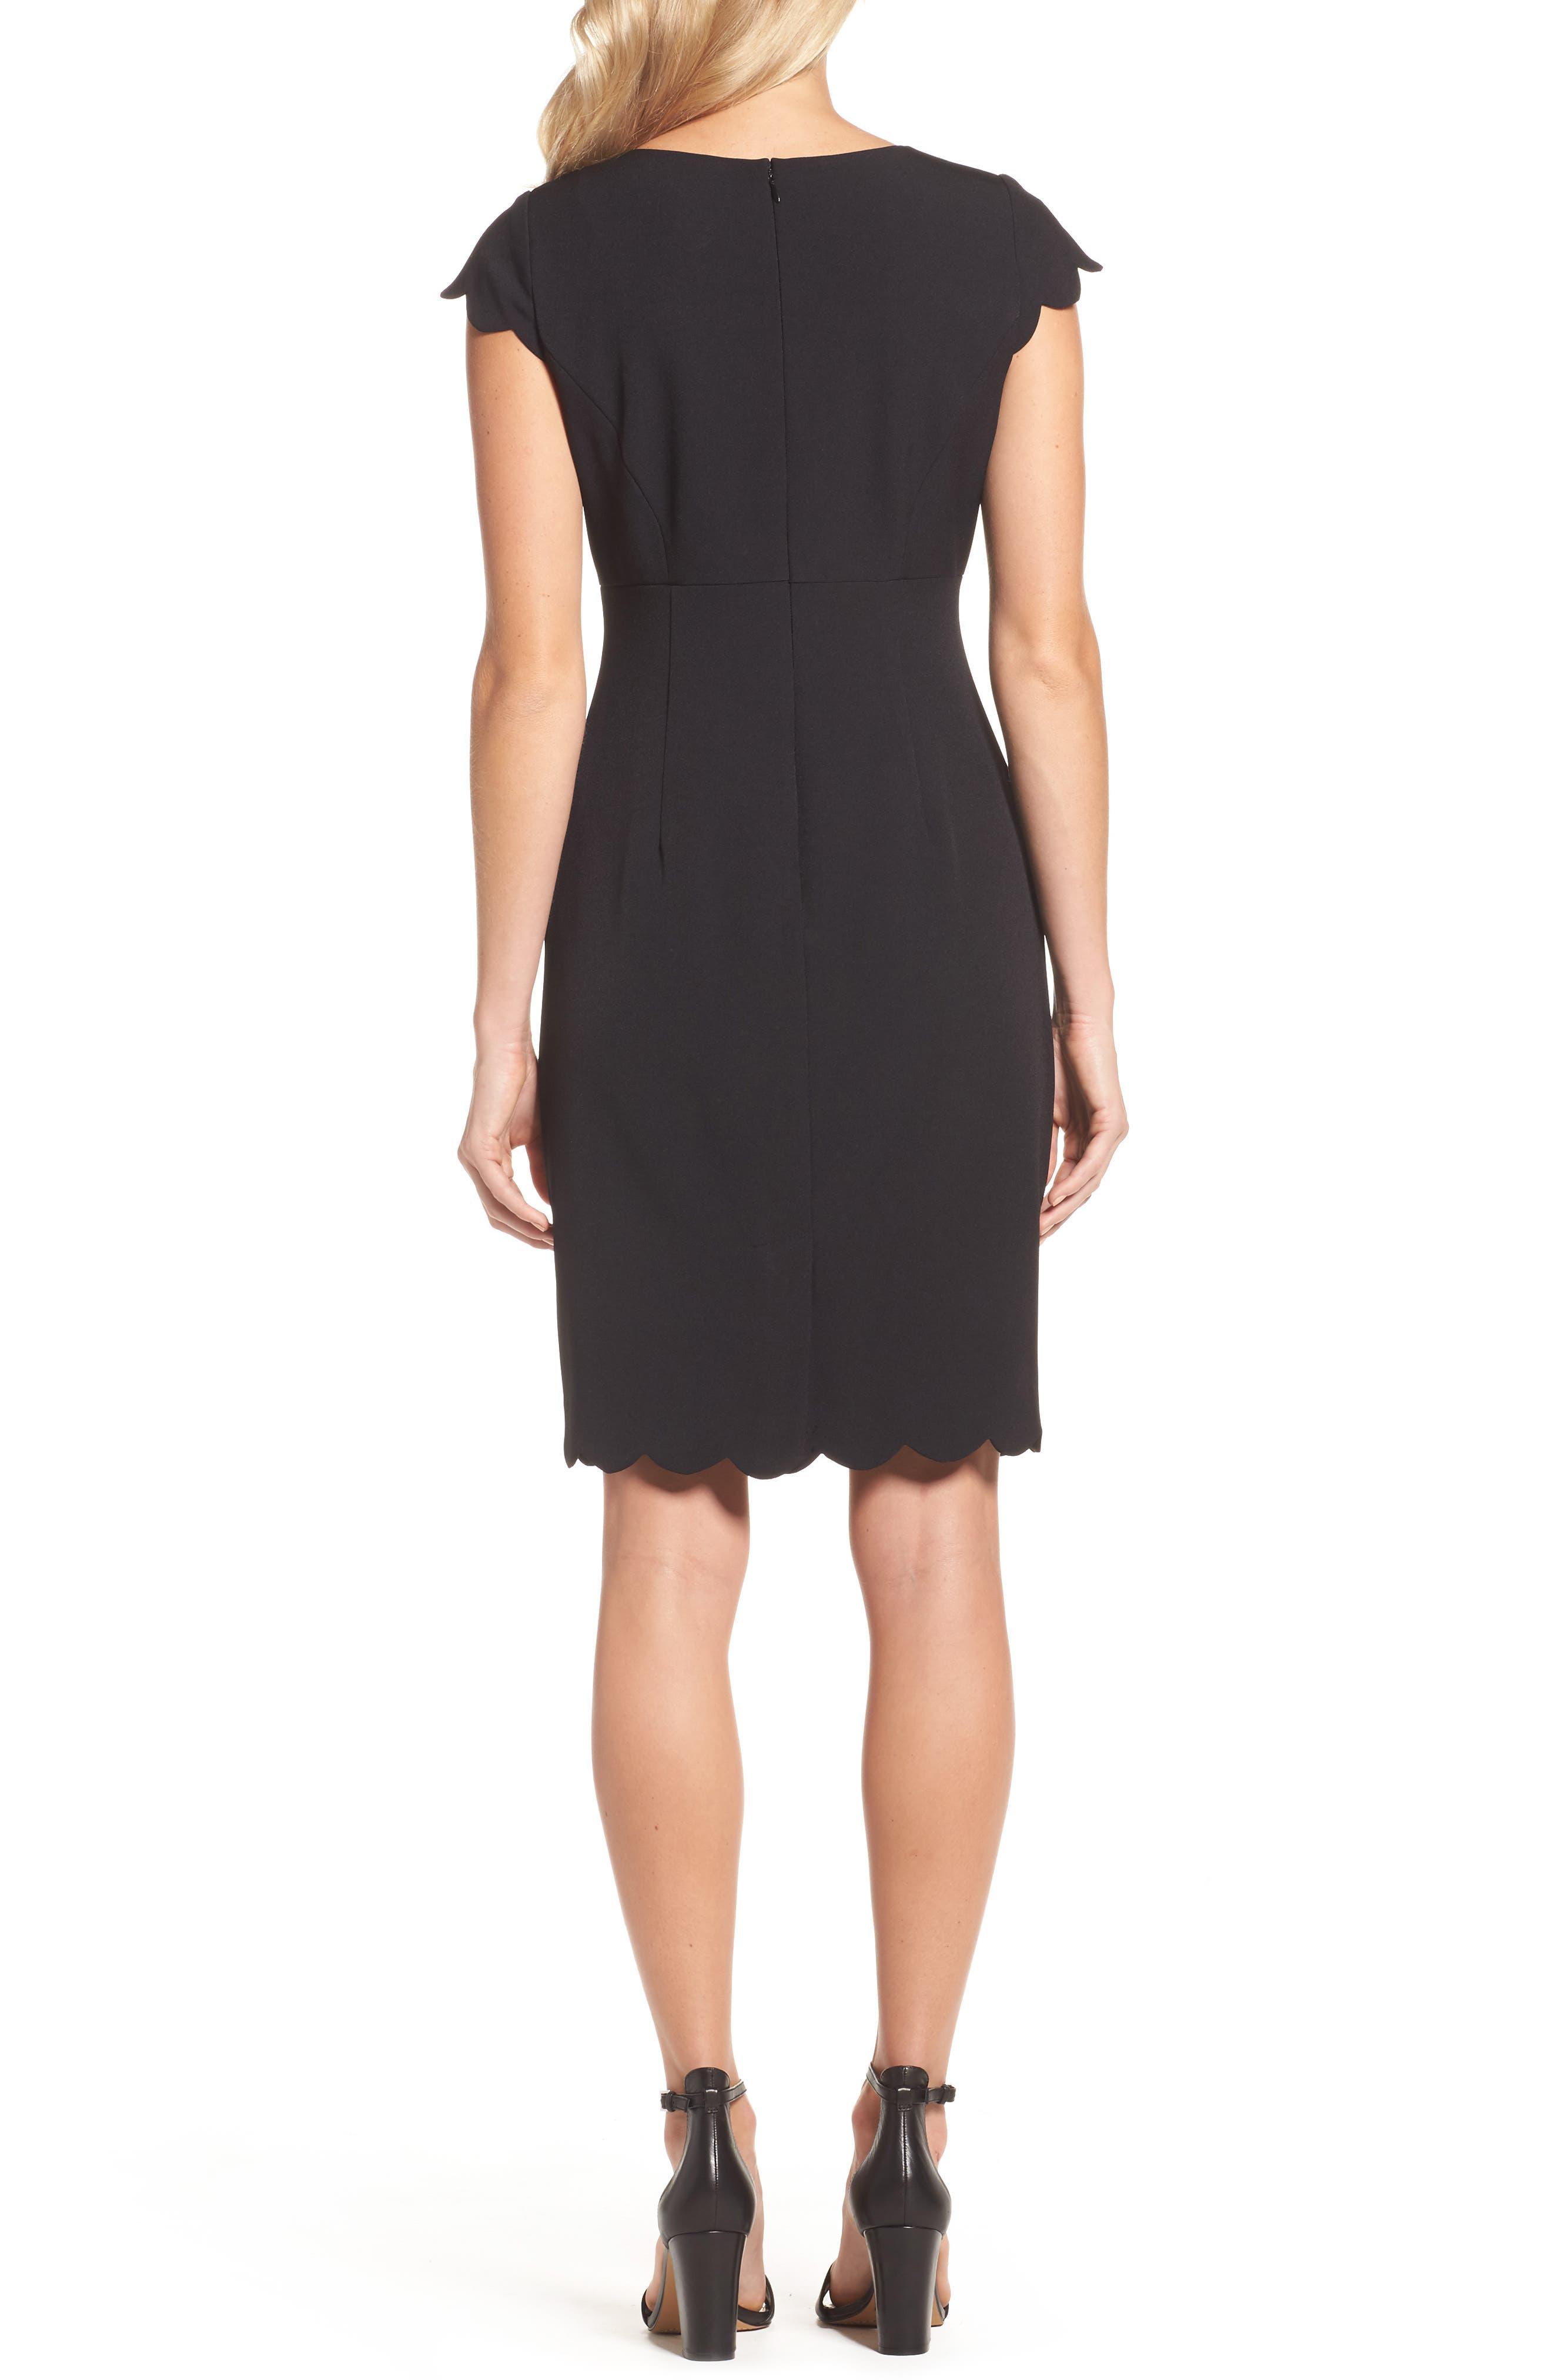 ADRIANNA PAPELL,                             Scalloped Crepe Sheath Dress,                             Alternate thumbnail 2, color,                             001